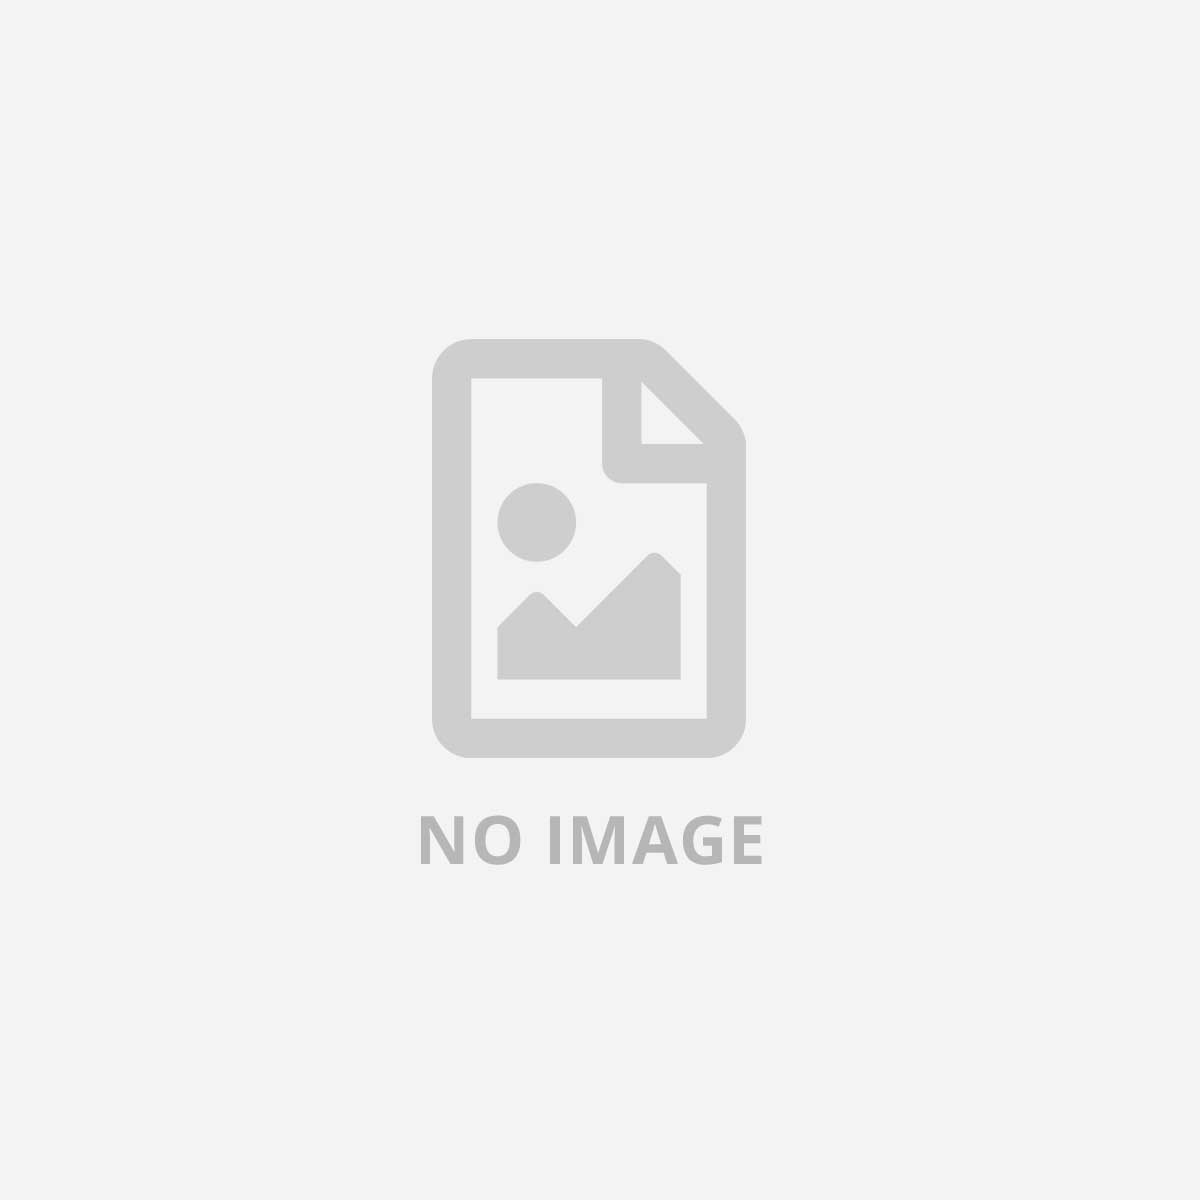 FUJIFILM SUPERIA X-TRA 400 135/36 1X